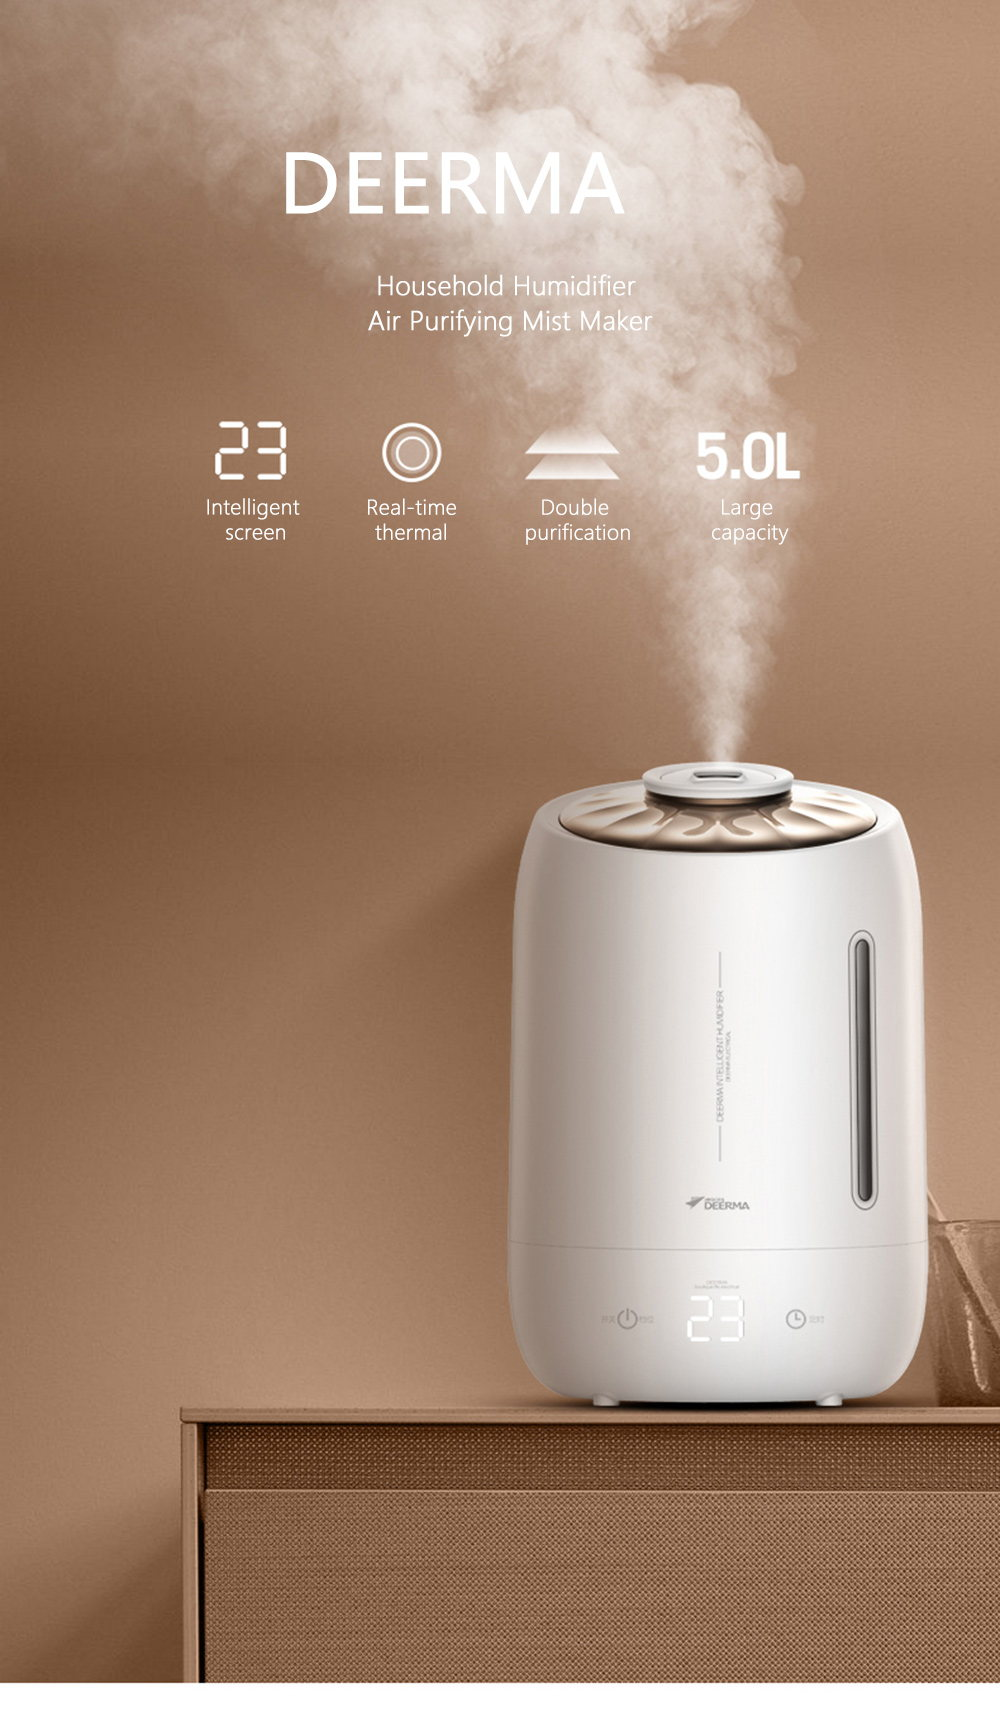 deerma dem-f600 household air humidifier